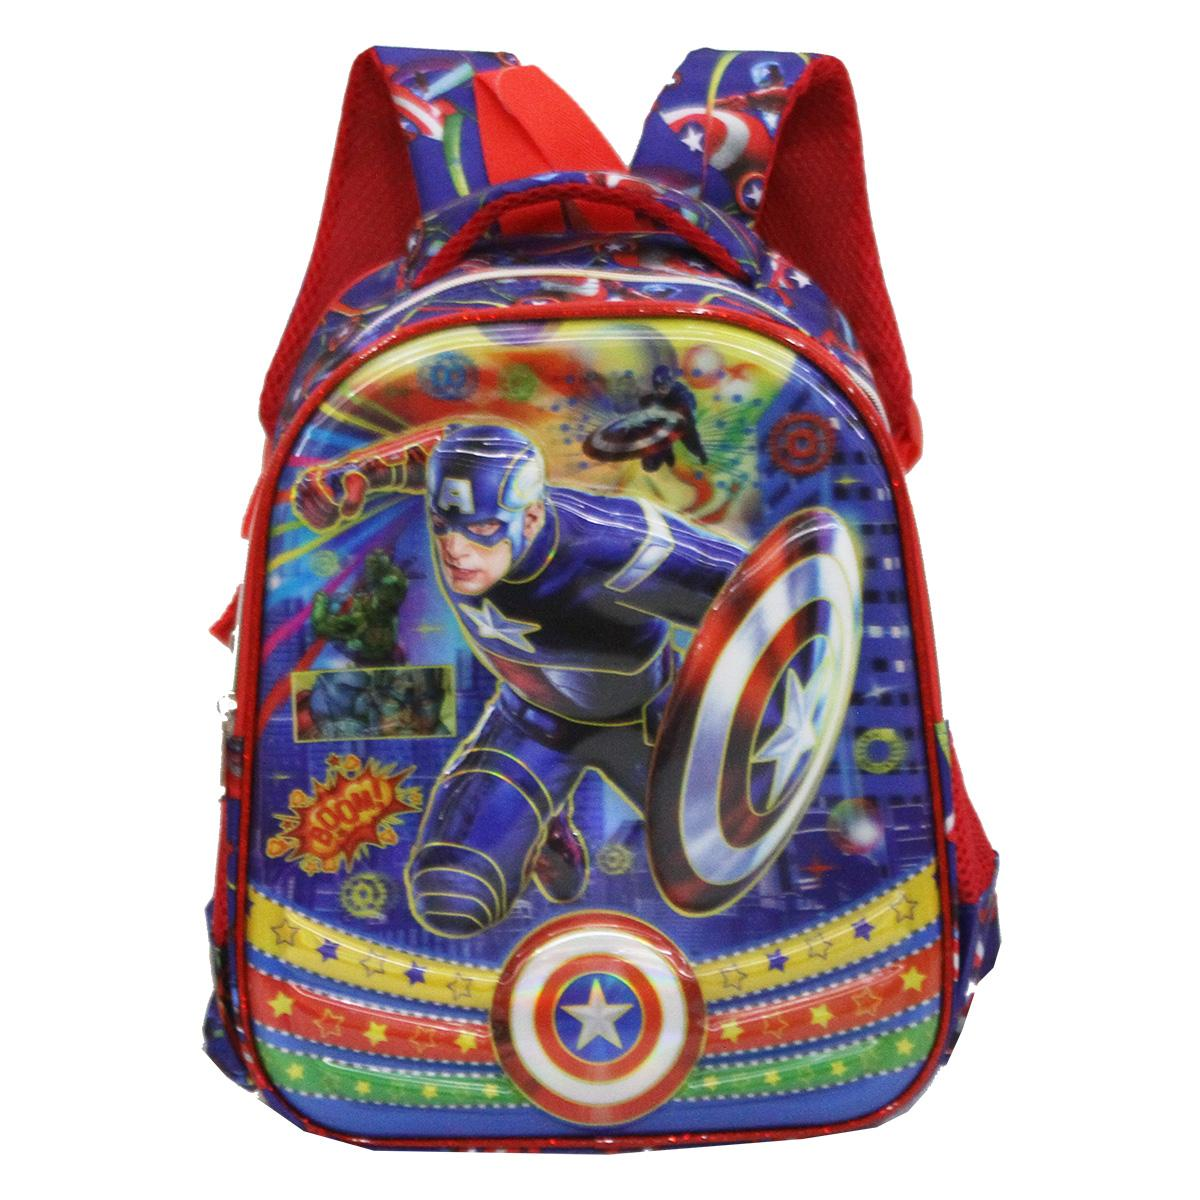 Onlan Avengers Super Hero 6D Timbul Tas Anak Sekolah Ransel TK & PG .